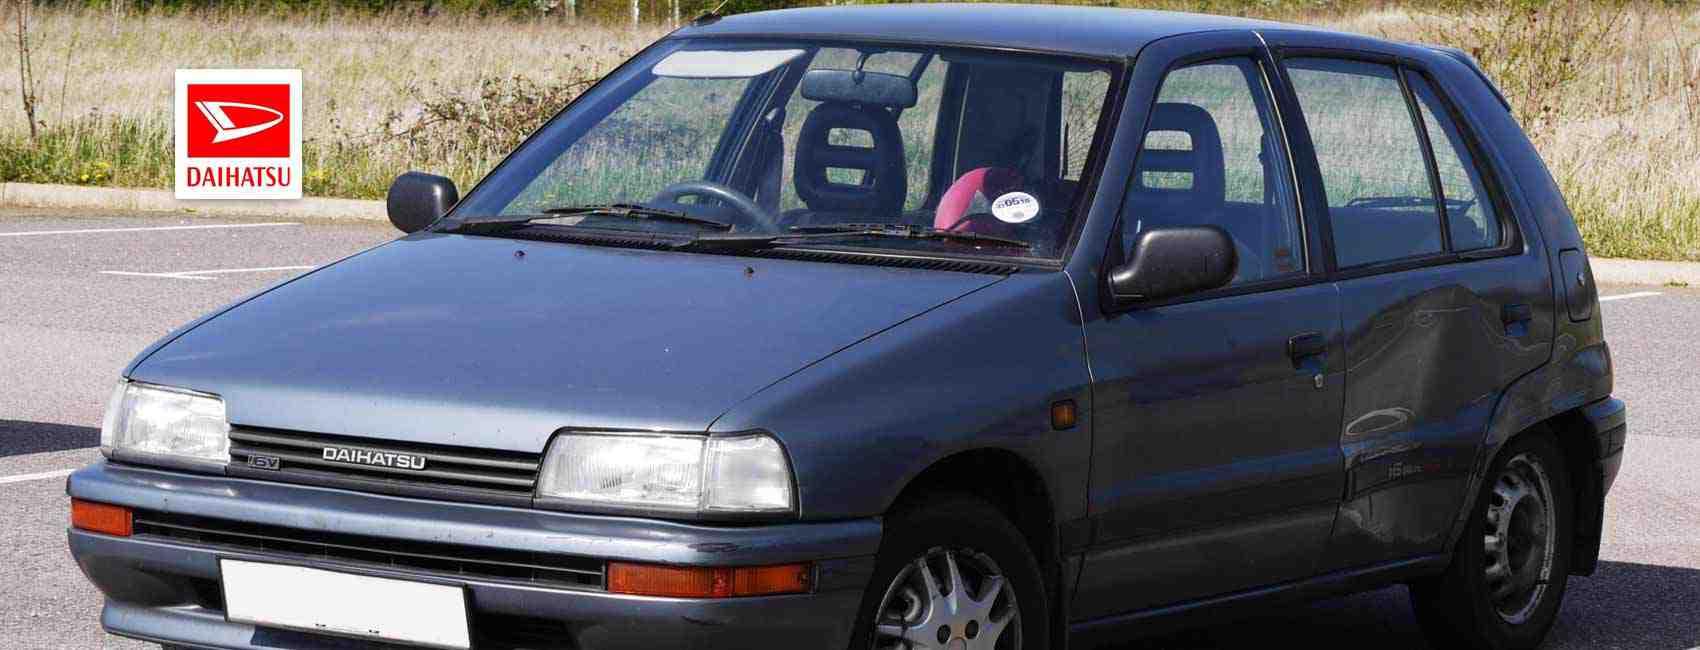 Used Daihatsu Parts - Buy Used Daihatsu OEM Parts Online @ Best Price